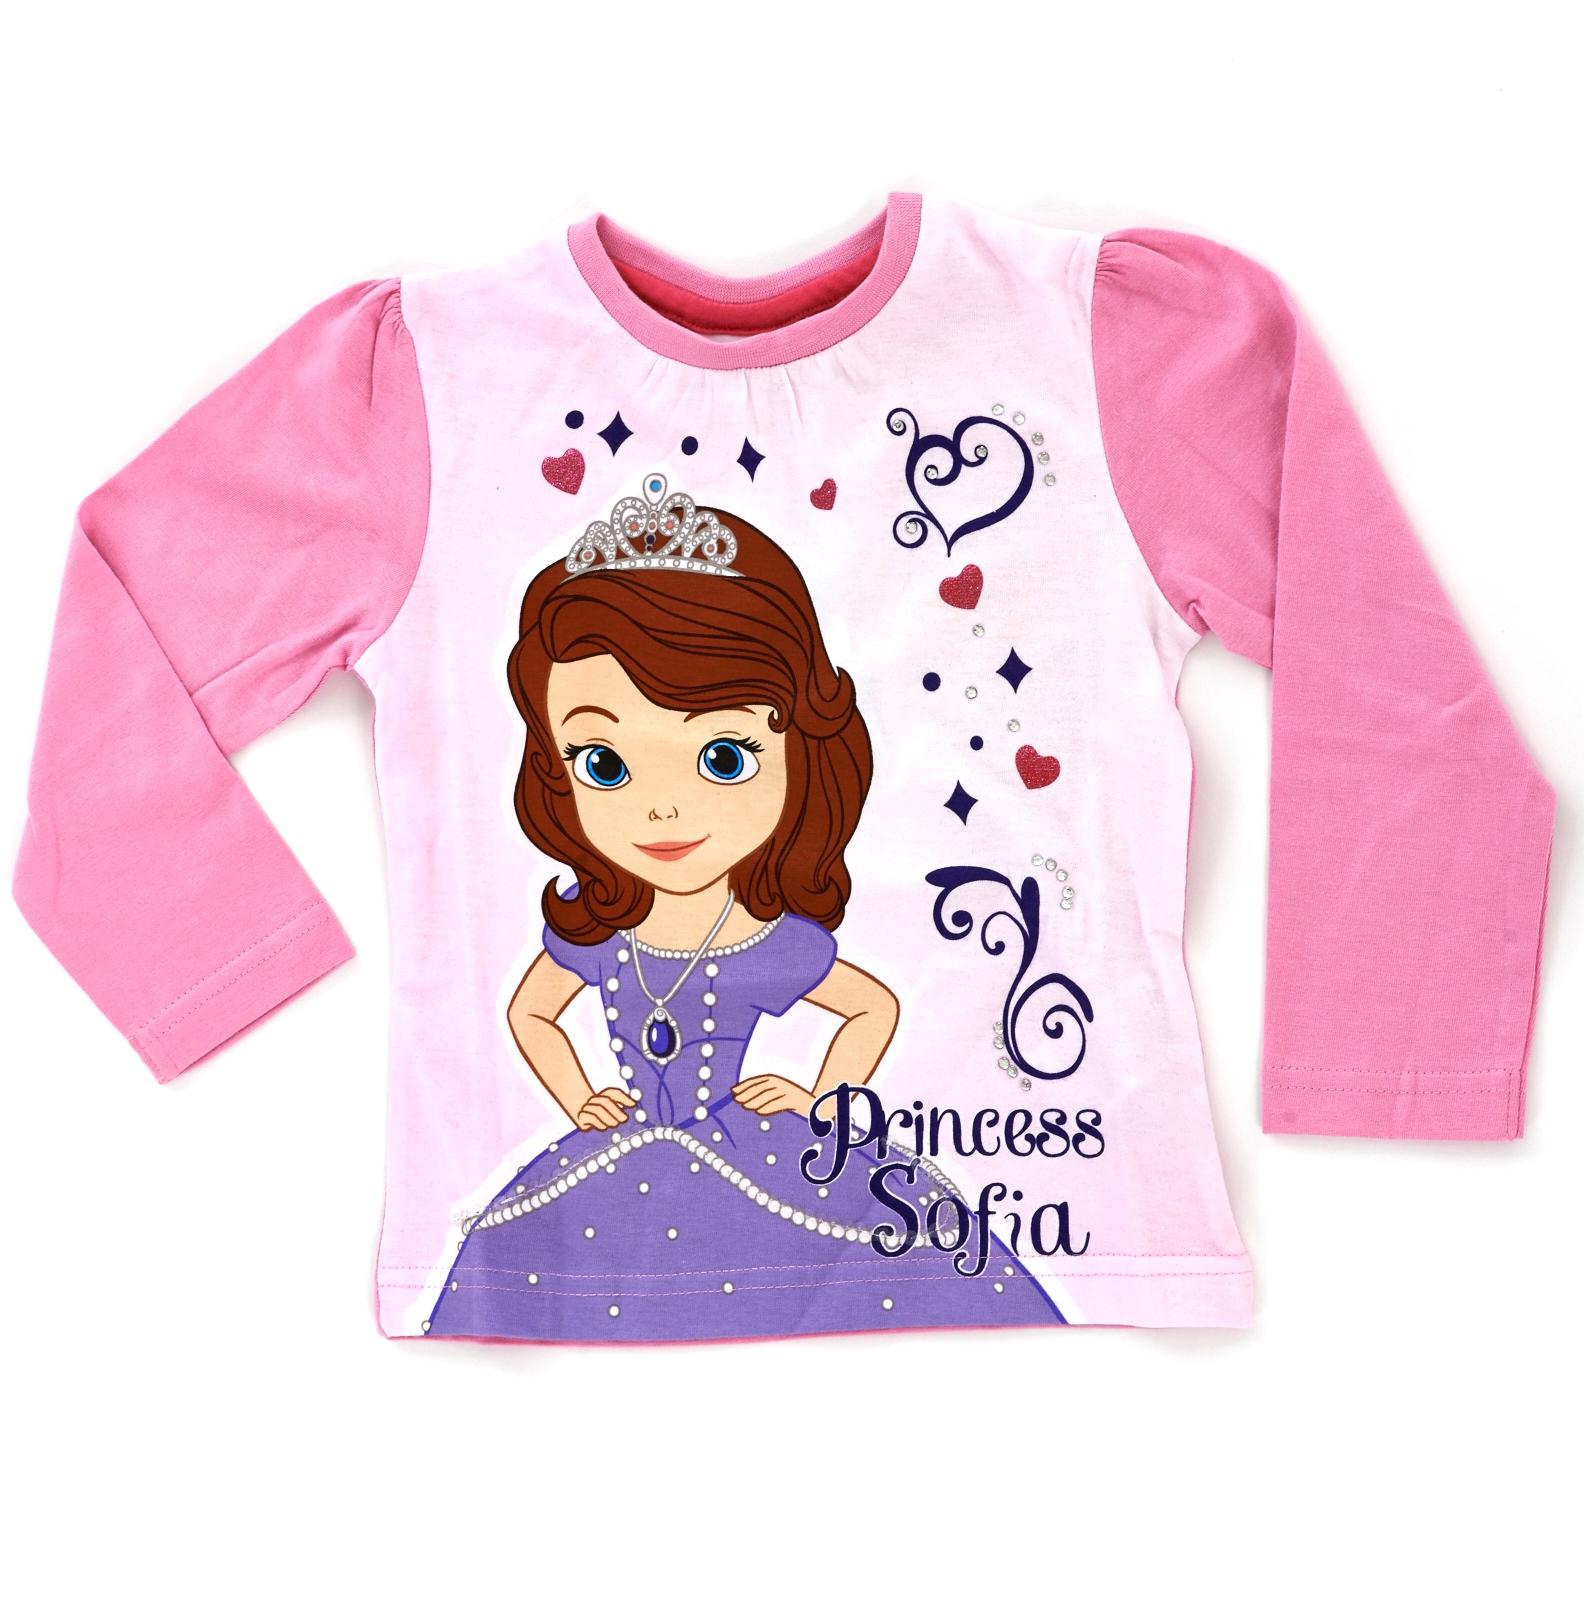 disney princess sofia 100 cotton long sleeve t shirt girls character top size ebay. Black Bedroom Furniture Sets. Home Design Ideas